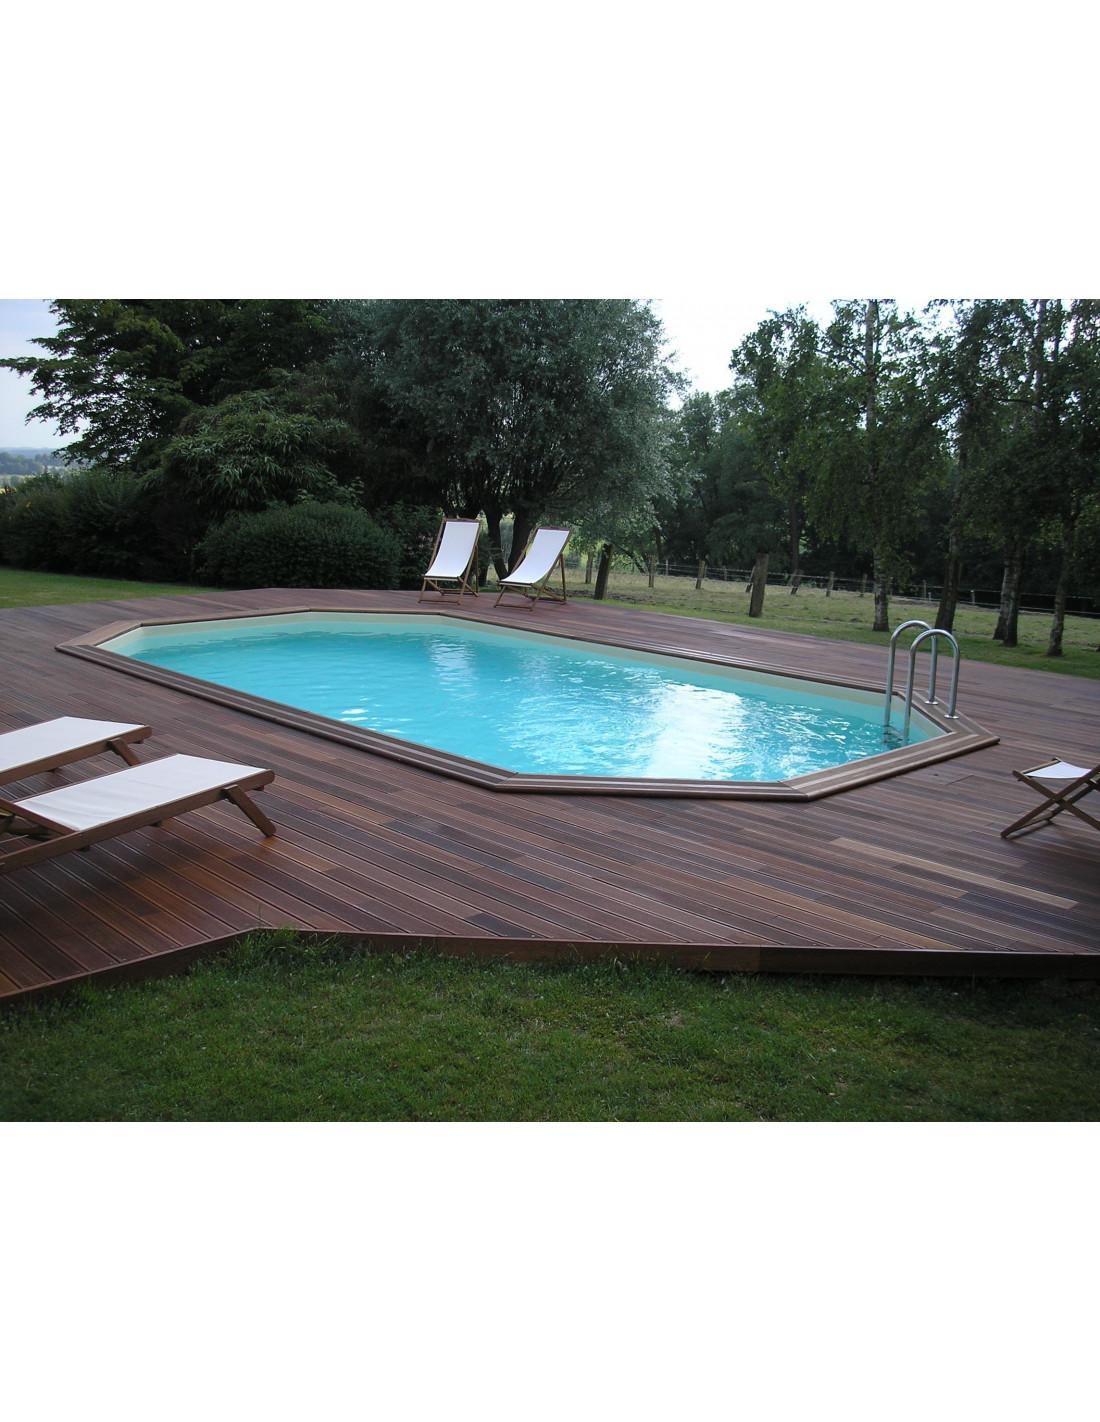 Piscine hors sol bois oc a 610 x 400 x 130 cm ubbink for Liner piscine octogonale